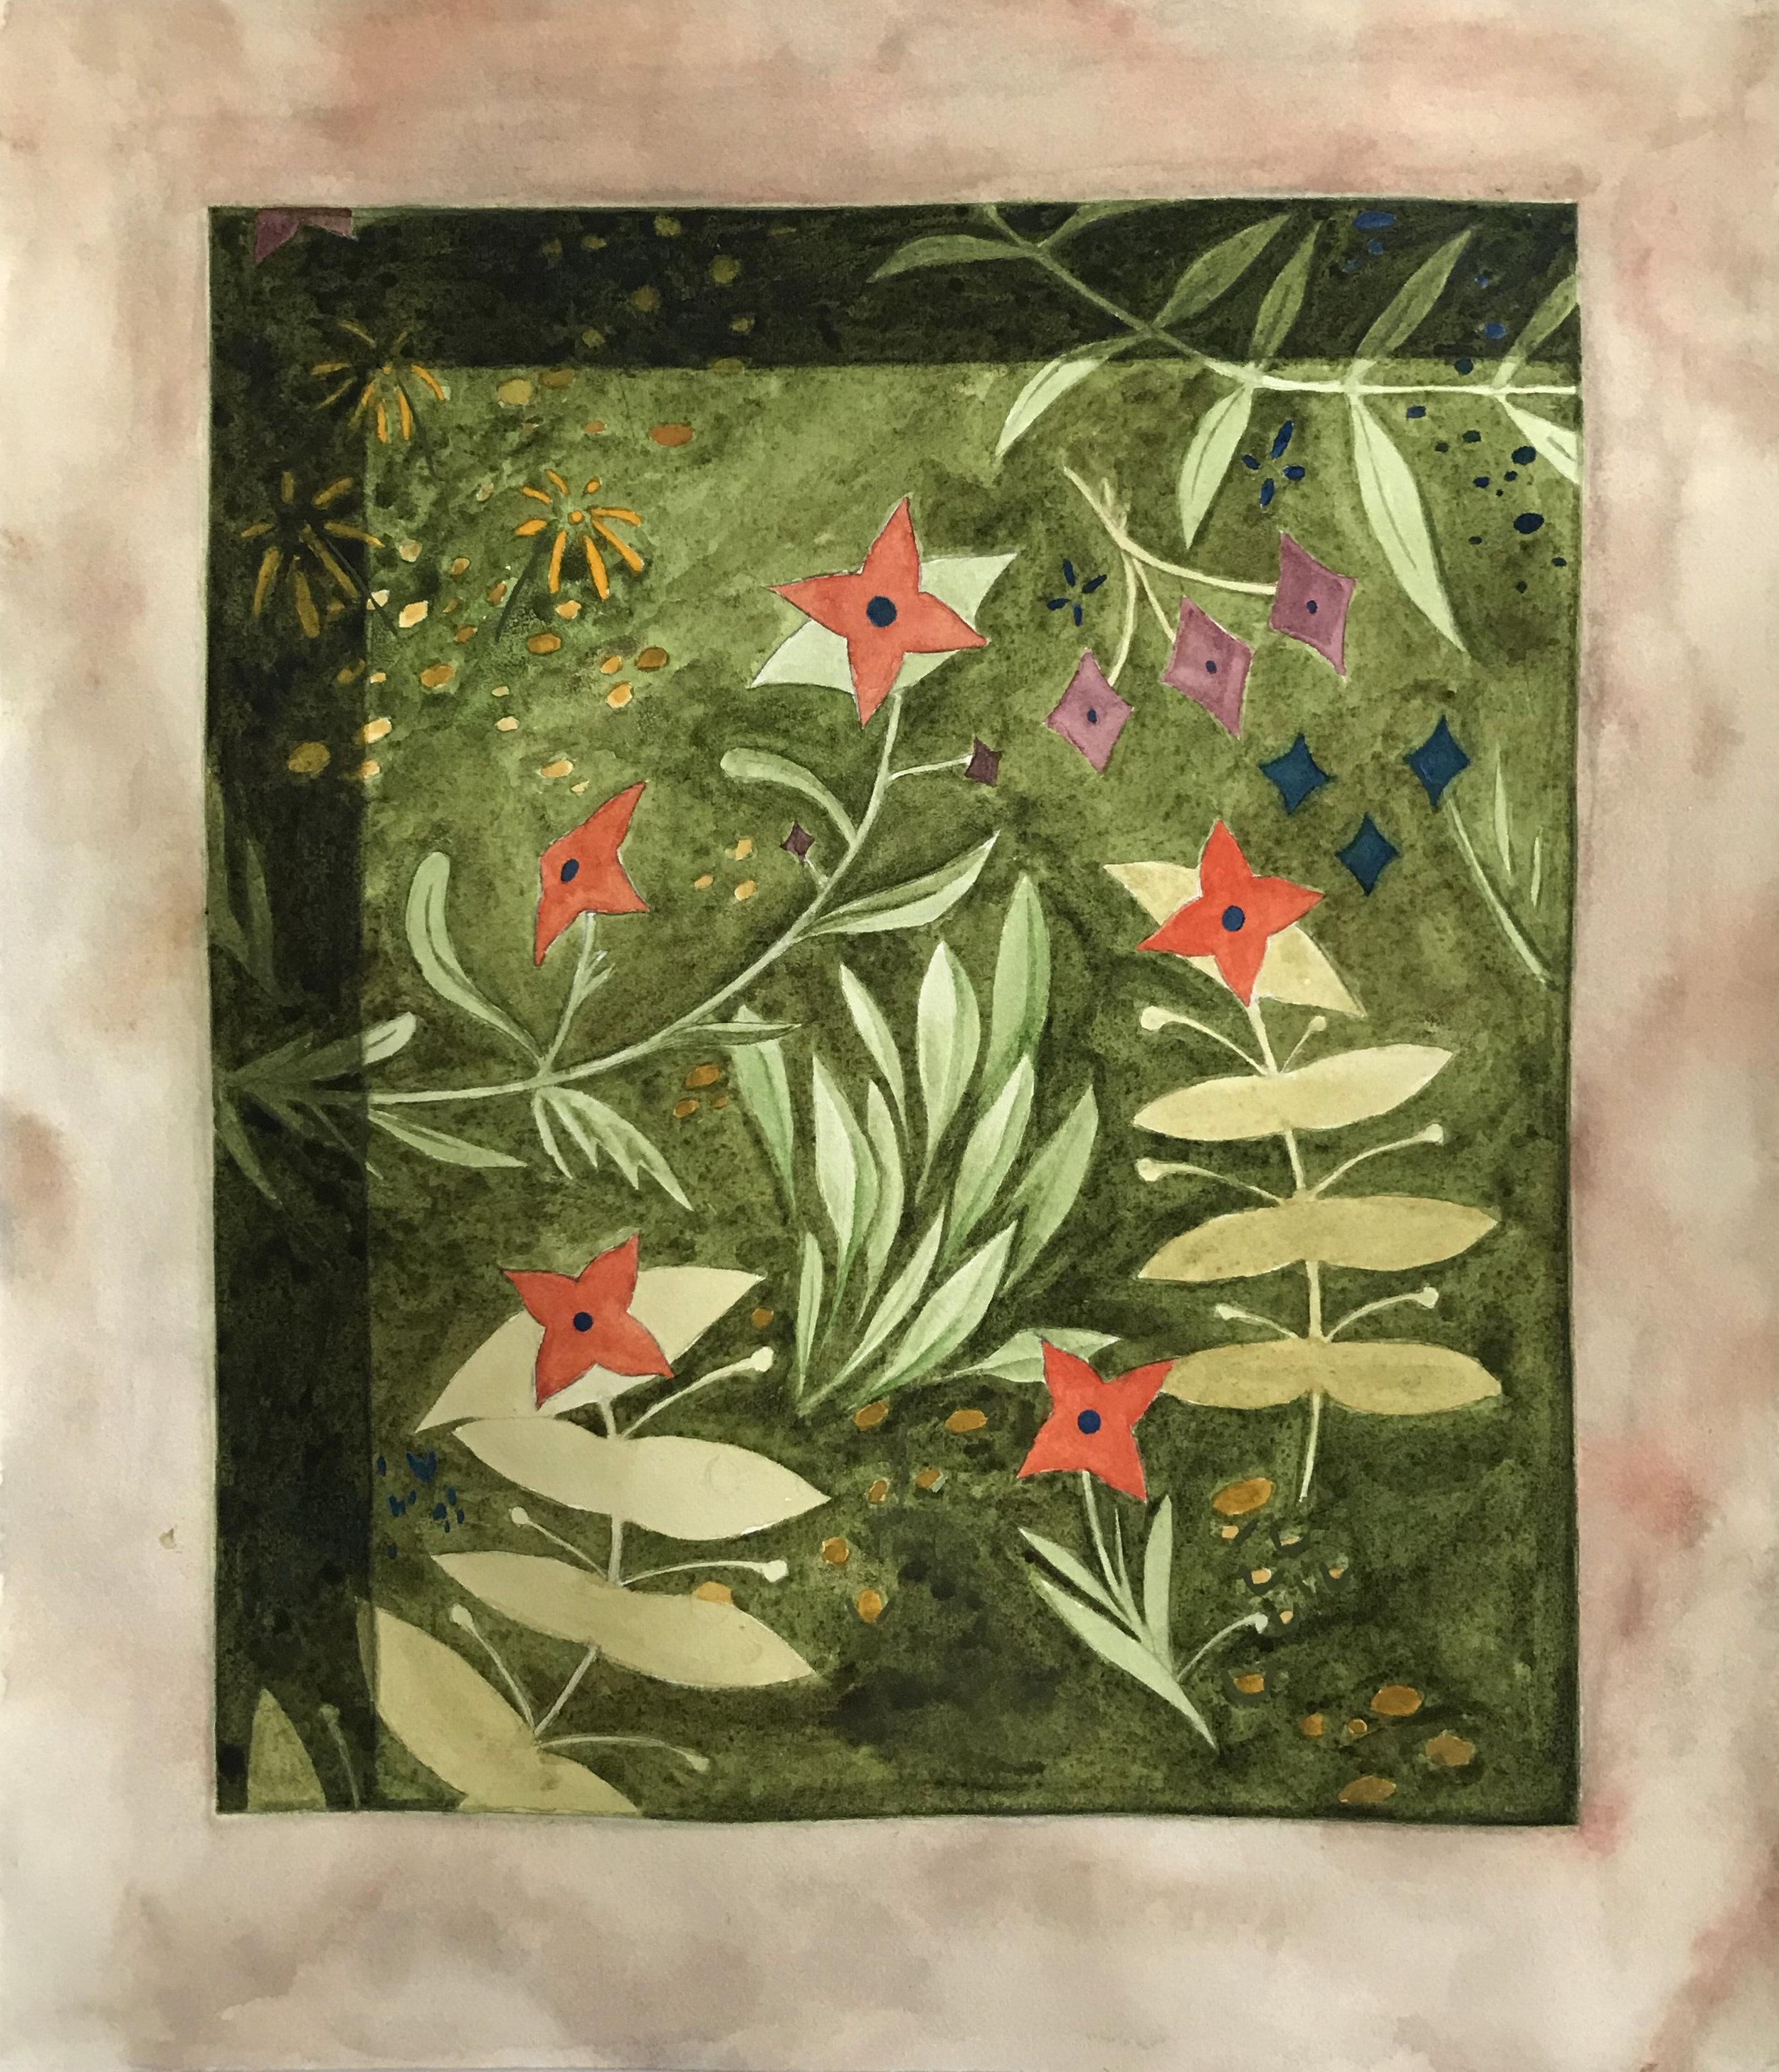 "The Garden (Stigmata) Study  2019  Watercolor and gouache on paper  10 x 8.5"""